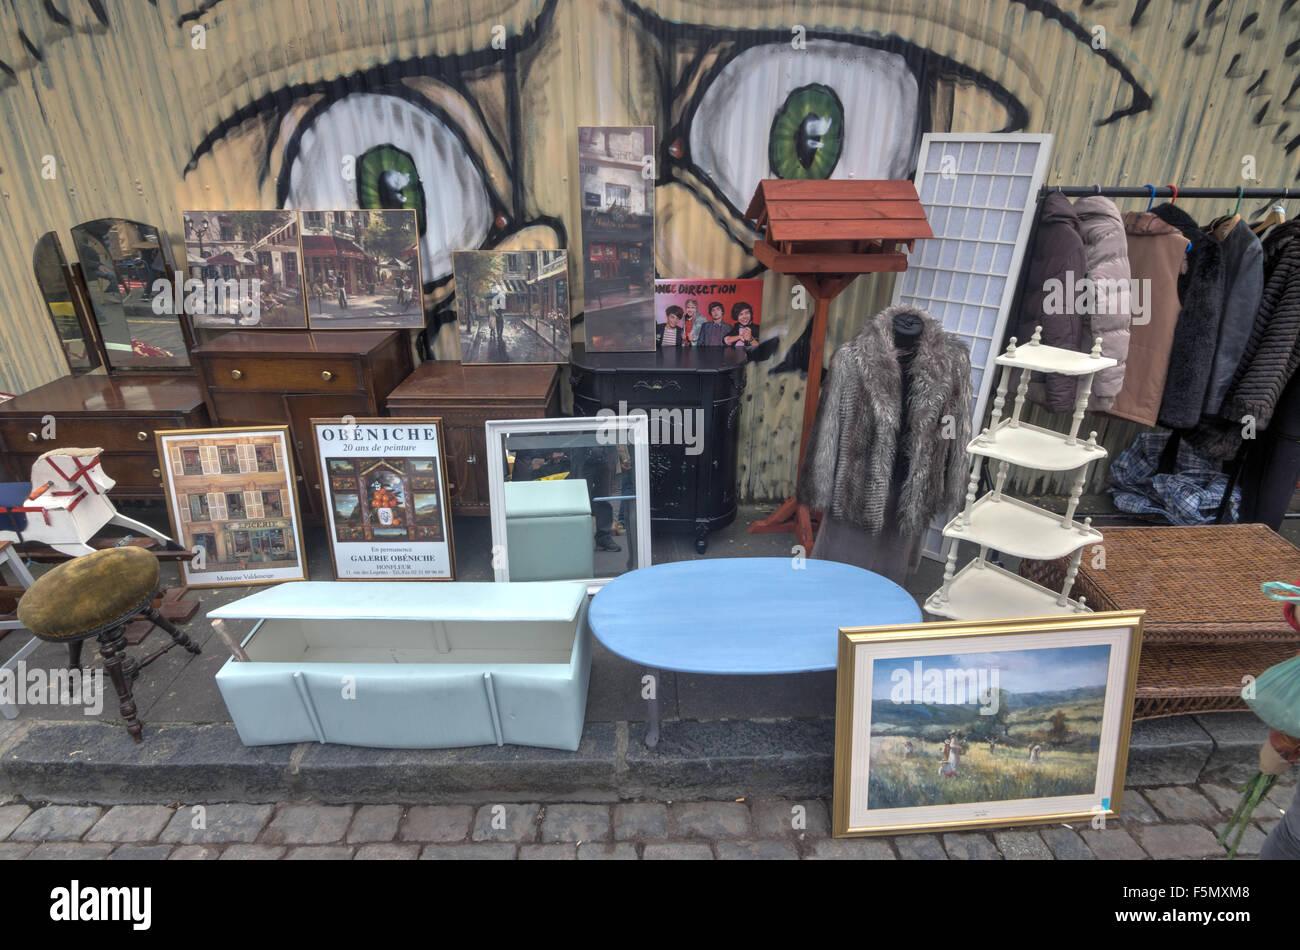 Merveilleux Market Furniture Stall, Second Hand Furniture For Sale